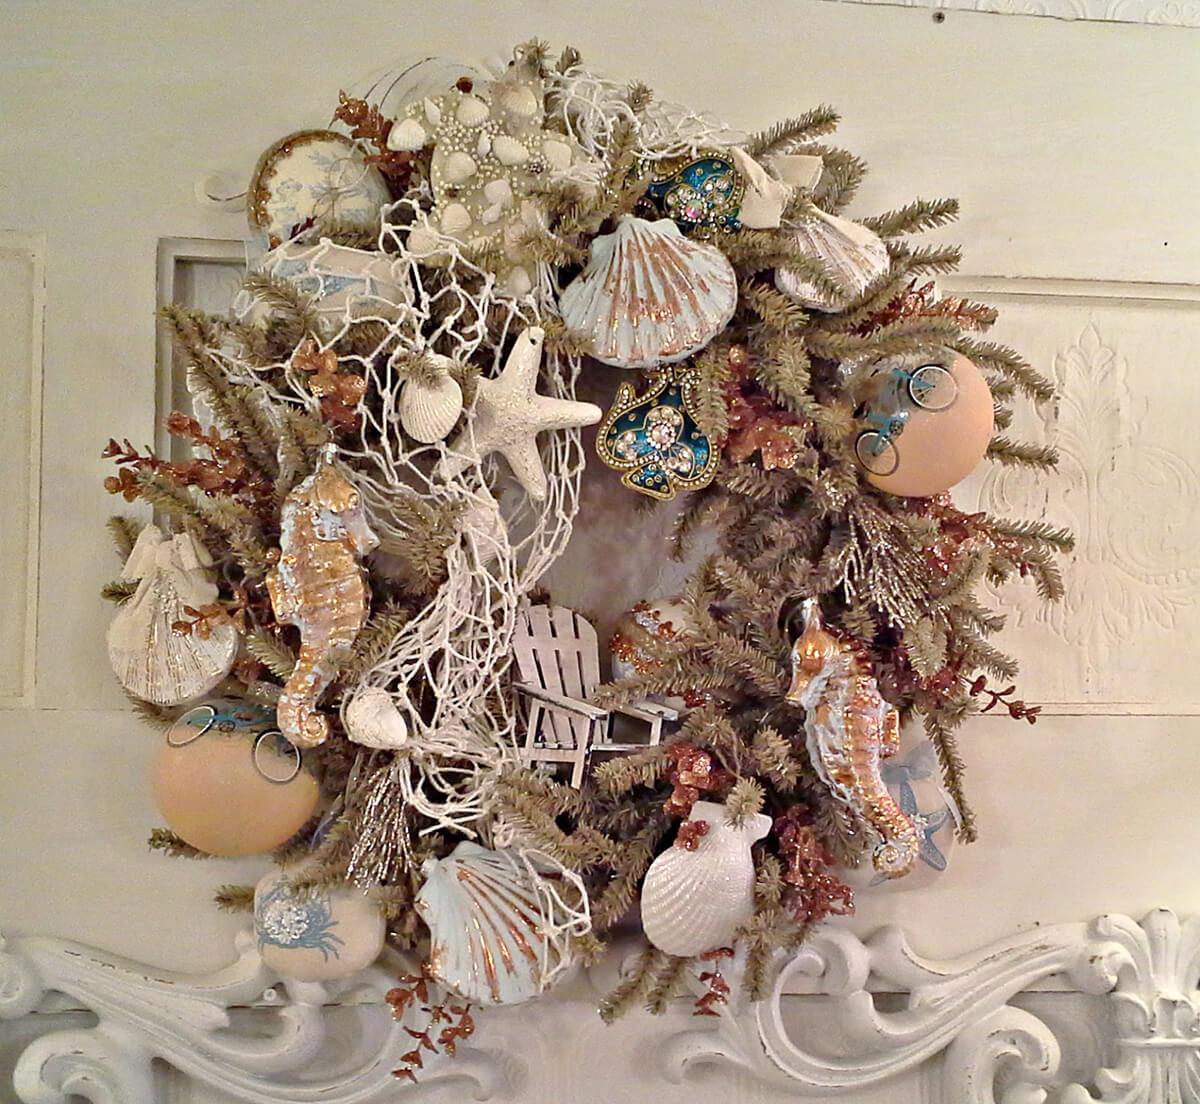 Smorgasboard of the Sea Nautical Christmas Wreath